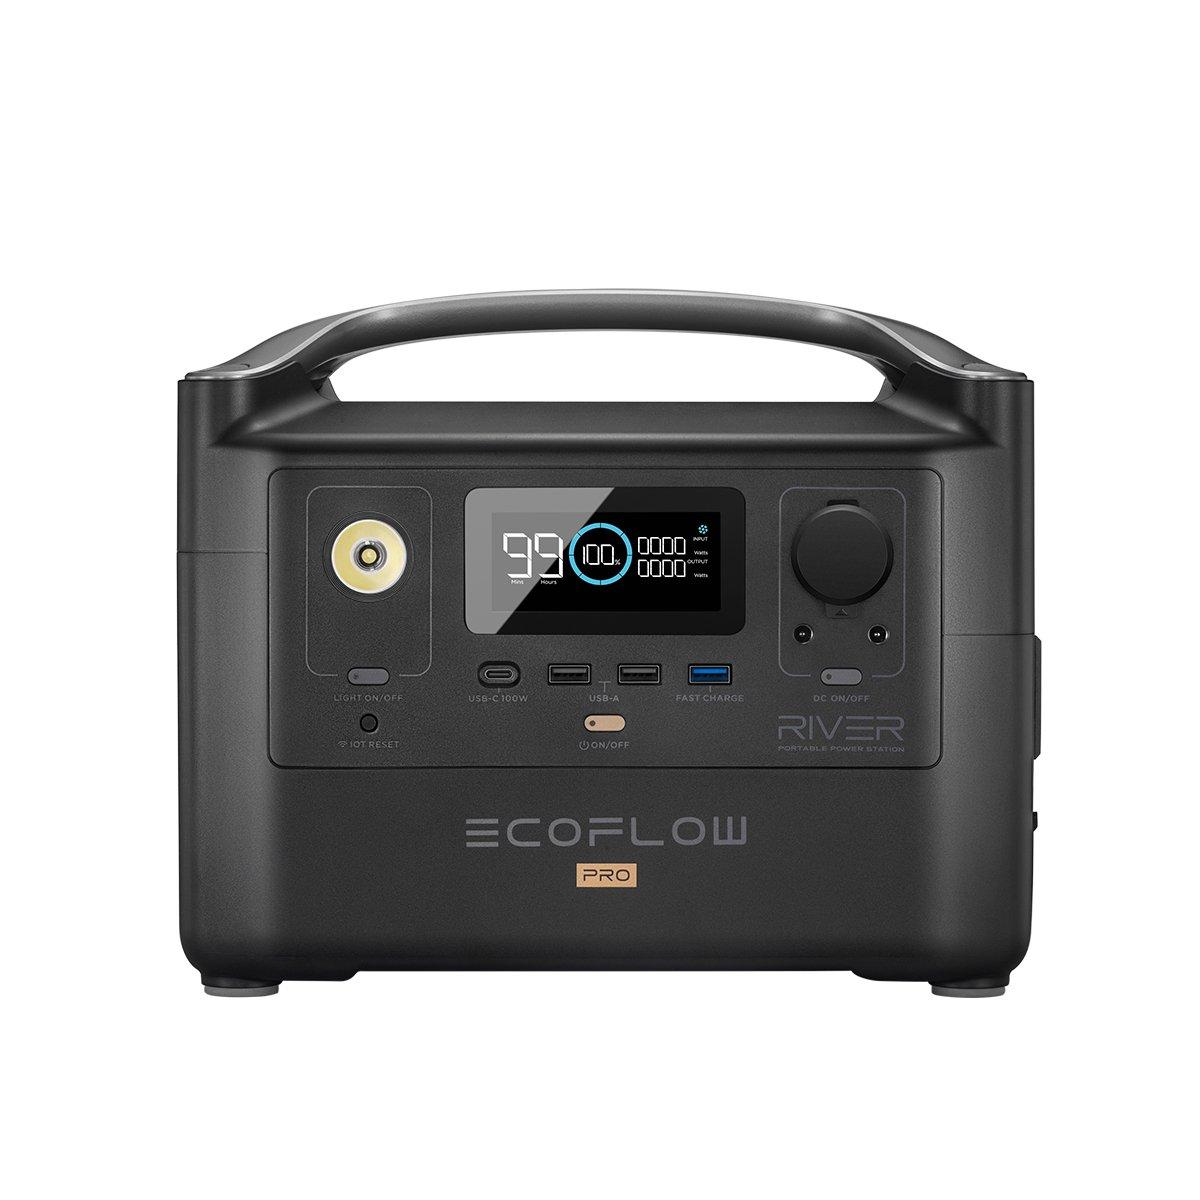 ecoflow-river-pro-Smart-Solar-Batteries-Professional-Installation-Solar-Sam-Missouri-Kansas-Iowa-Illinois-Residential-Homes-Commercial-Businesses-Agricultural-Farms